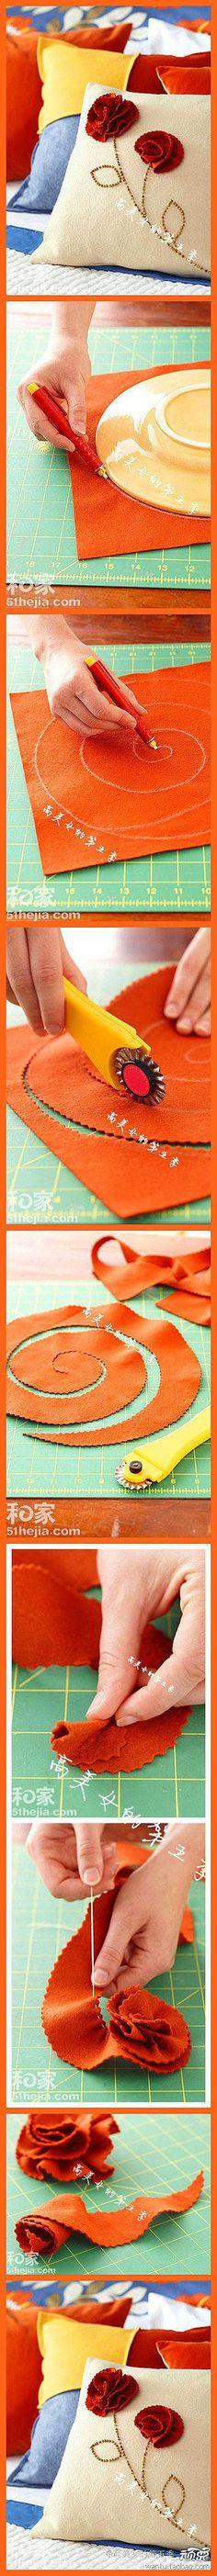 DIY Tutorial DIY Pillow Shams / DIY Decorative Flower Pillow - Bead&Cord